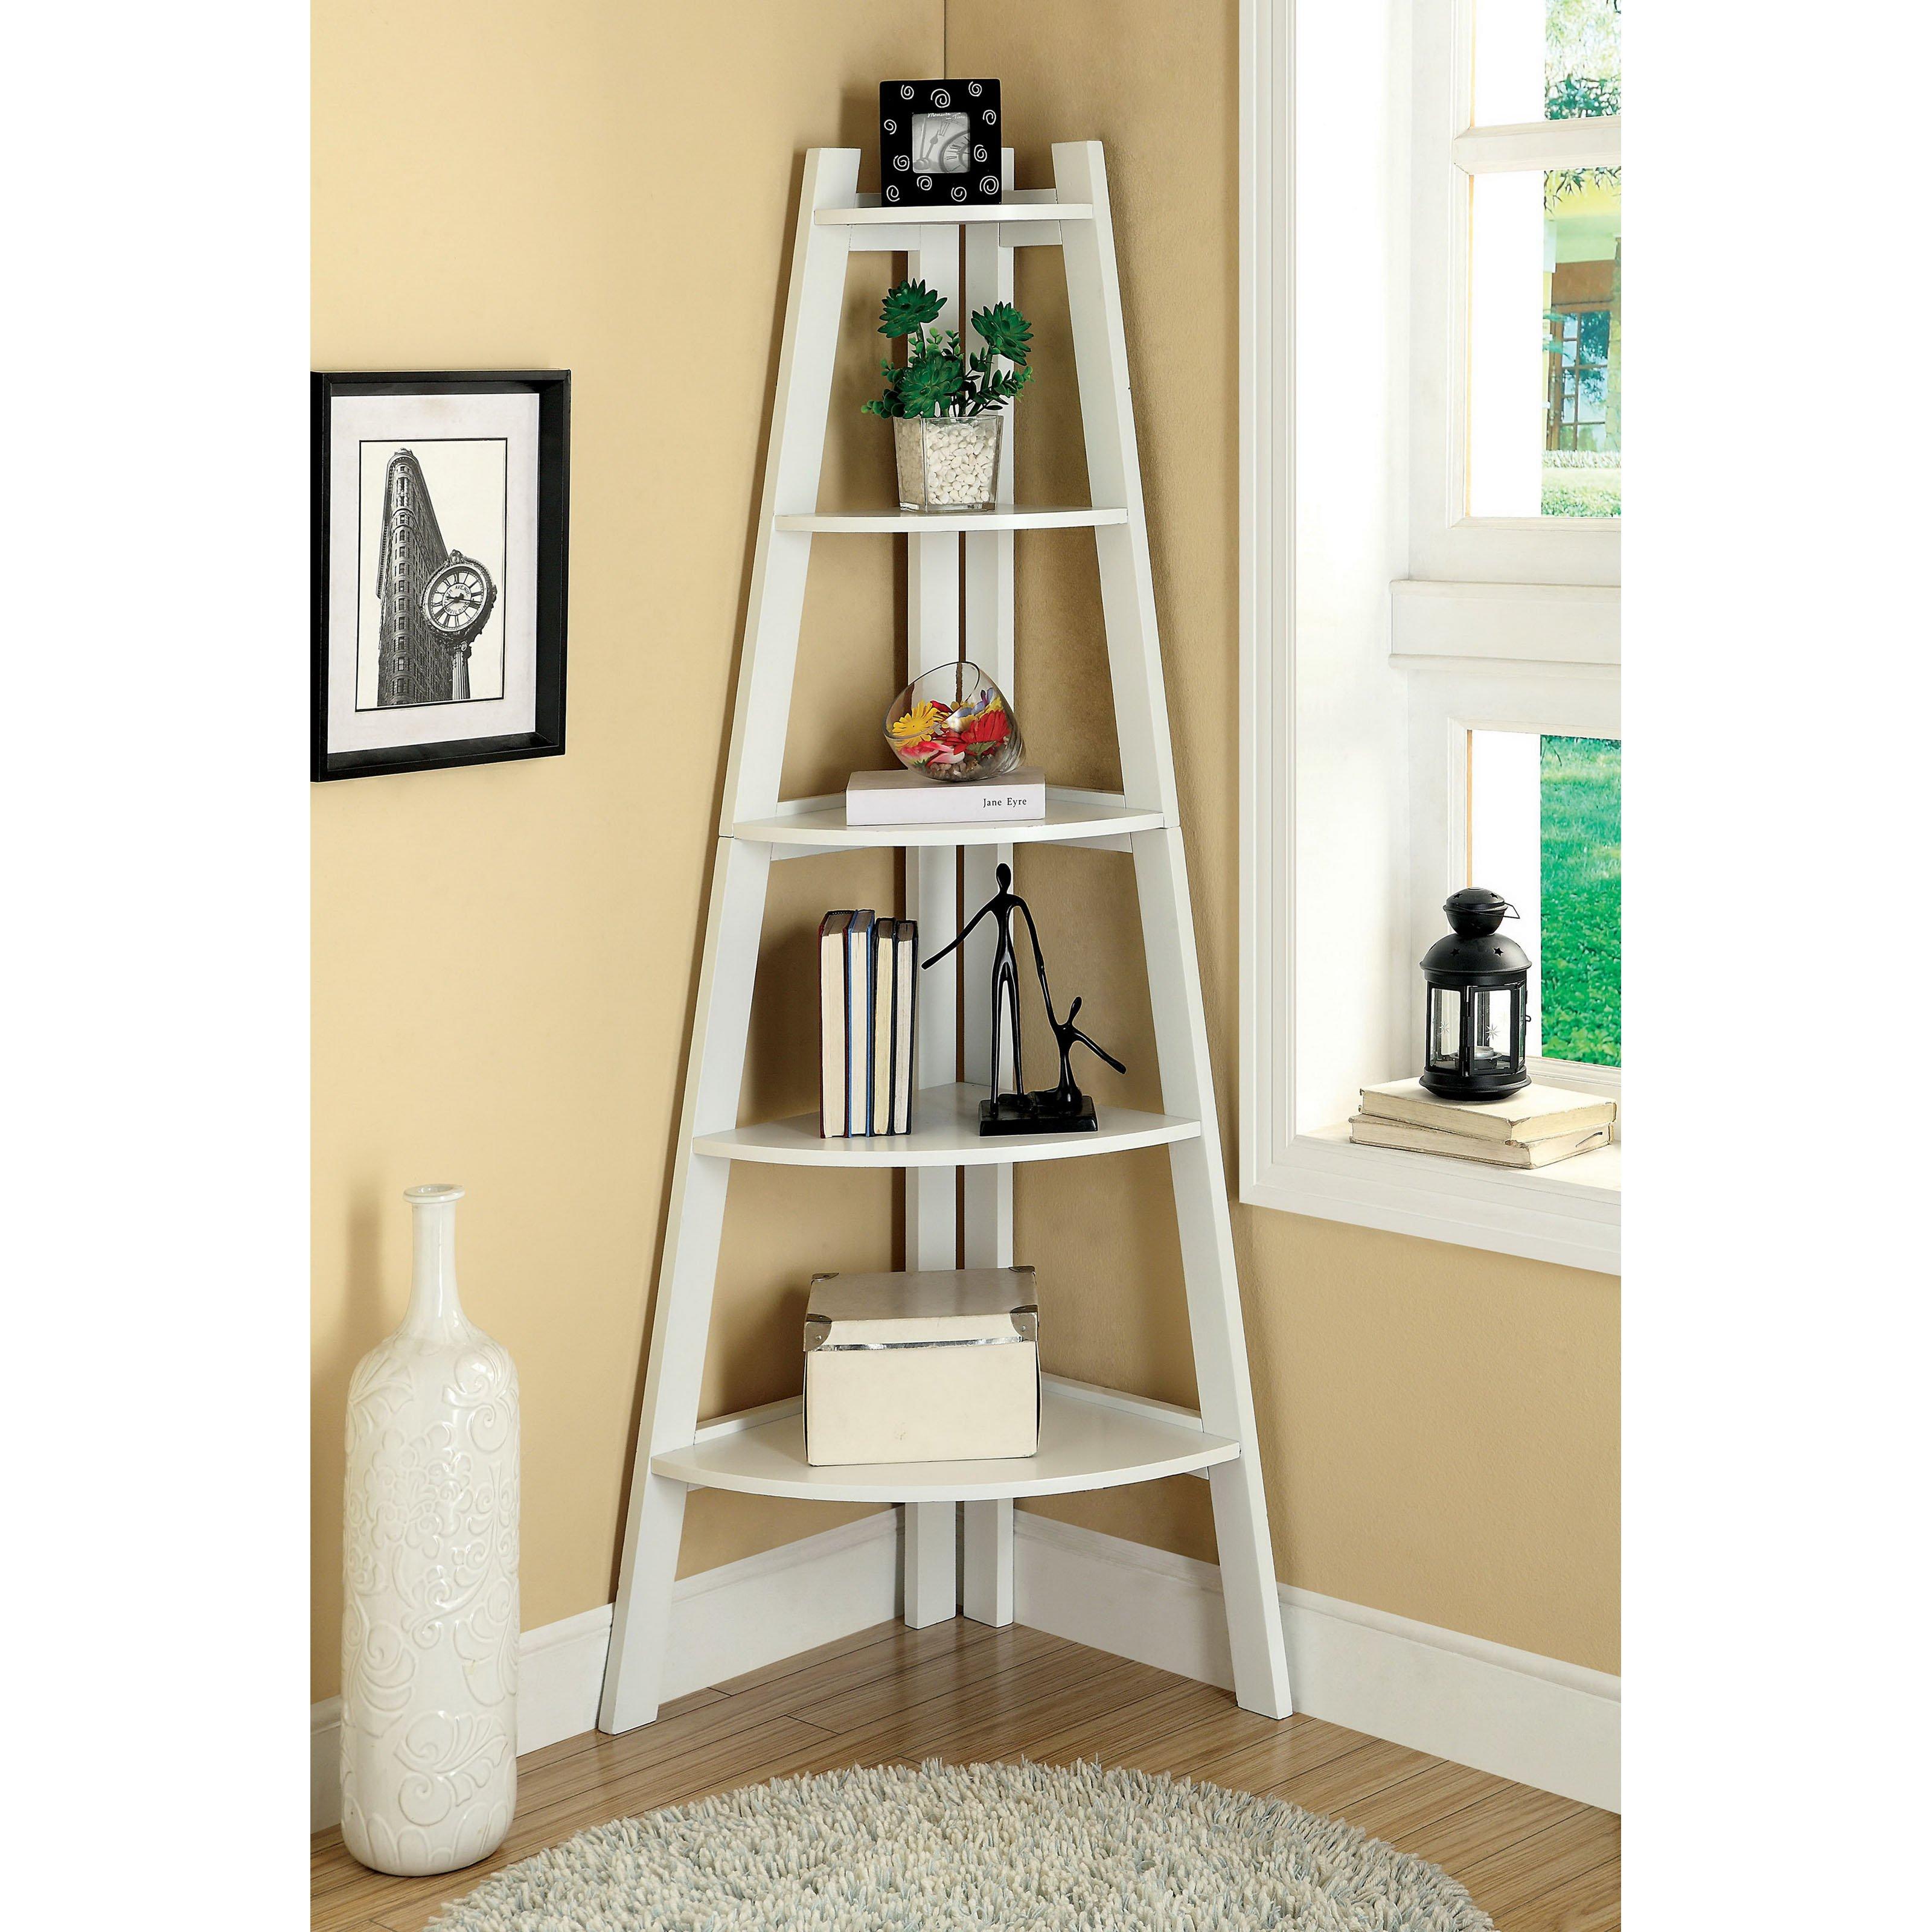 Awesome White Corner Leaning Ladder Bookshelf Near Wndow And Round Fur Rug